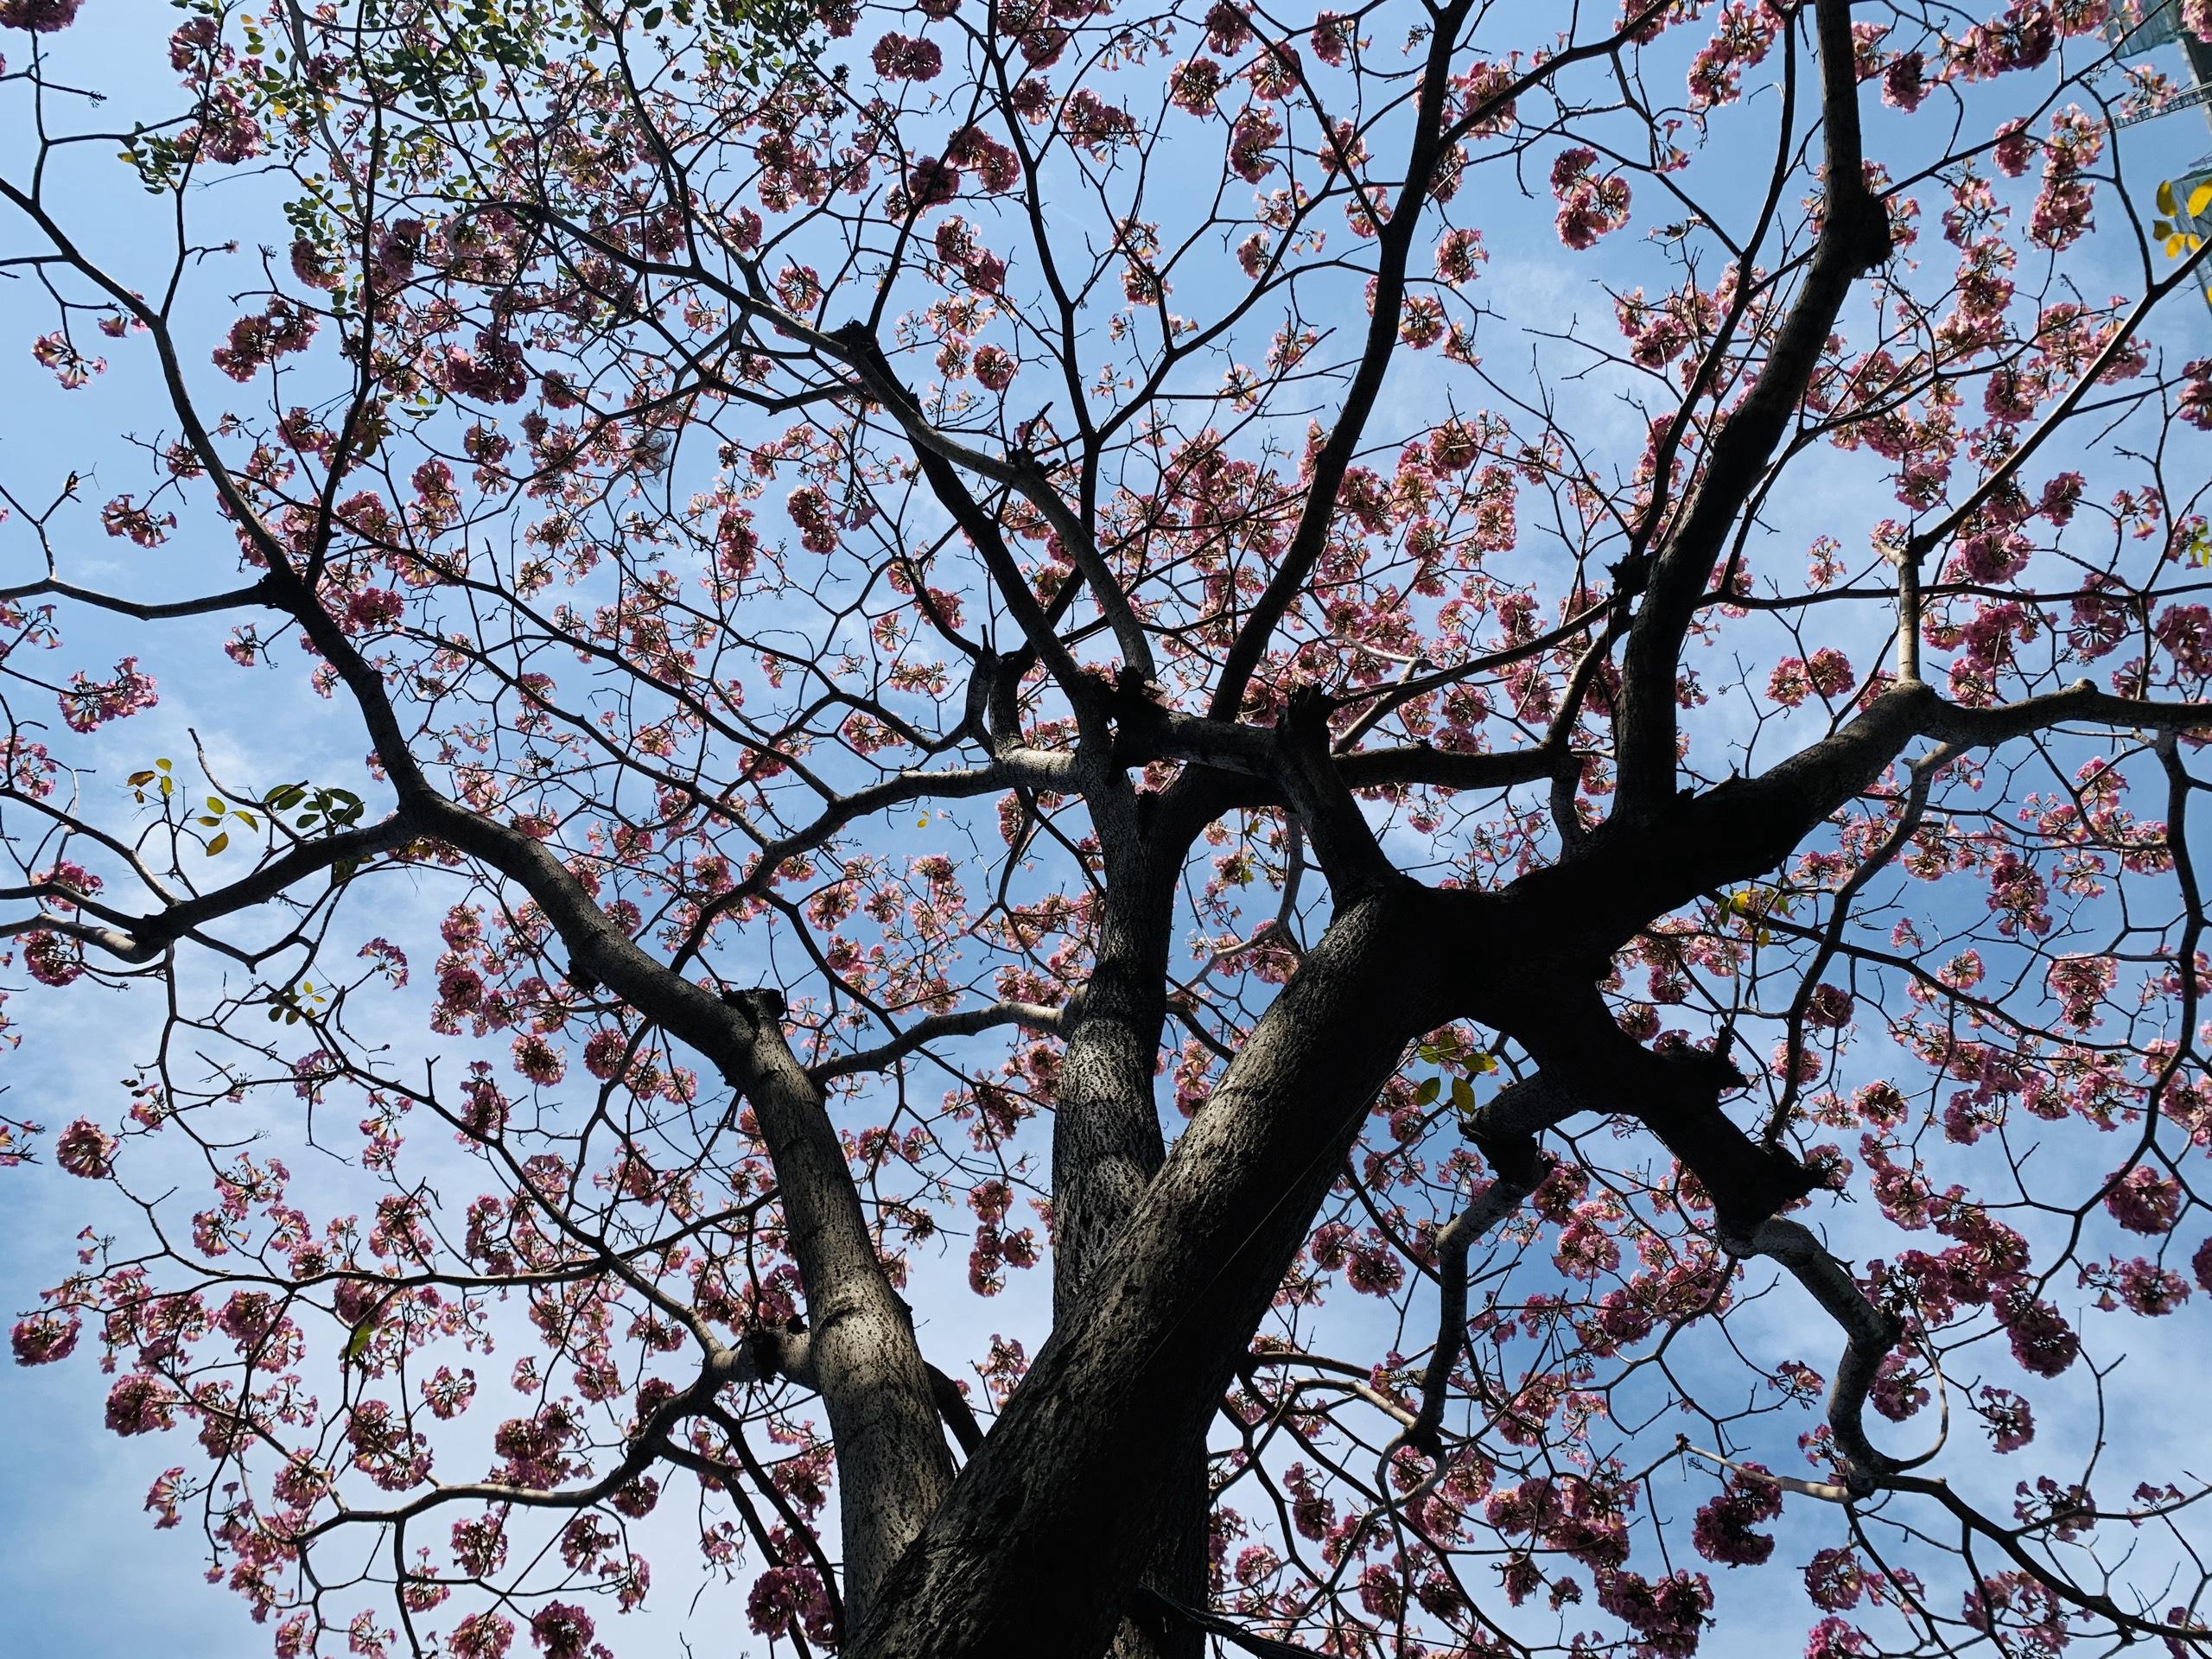 Hoa kèn hồng khoe sắc sớm